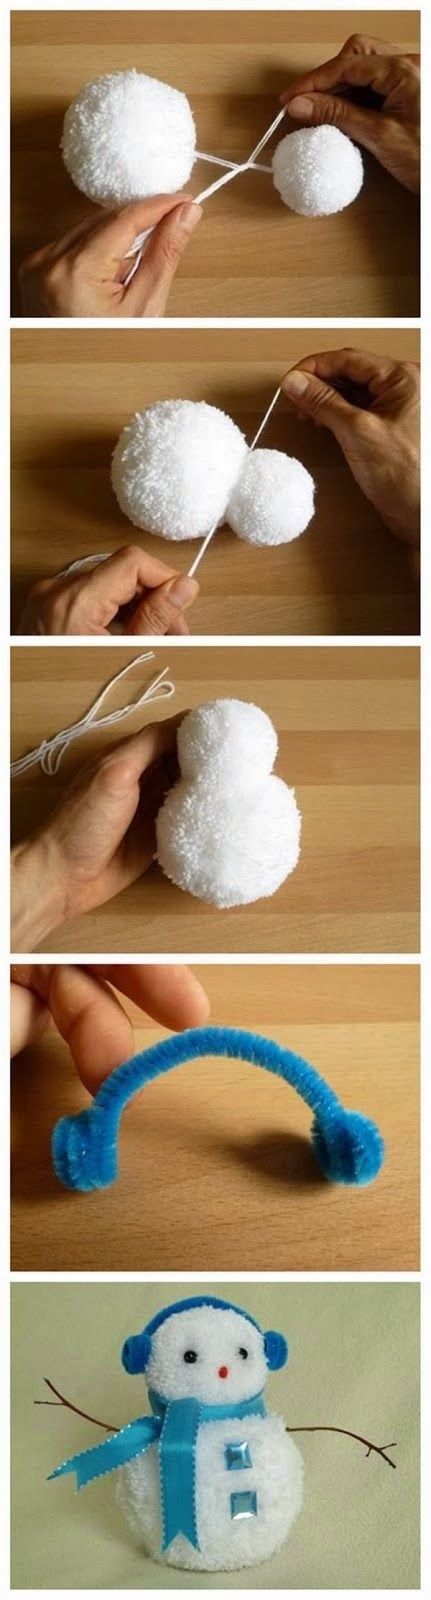 DIY Snowman winter diy craft crafts easy crafts diy ideas snowmen crafts for kids